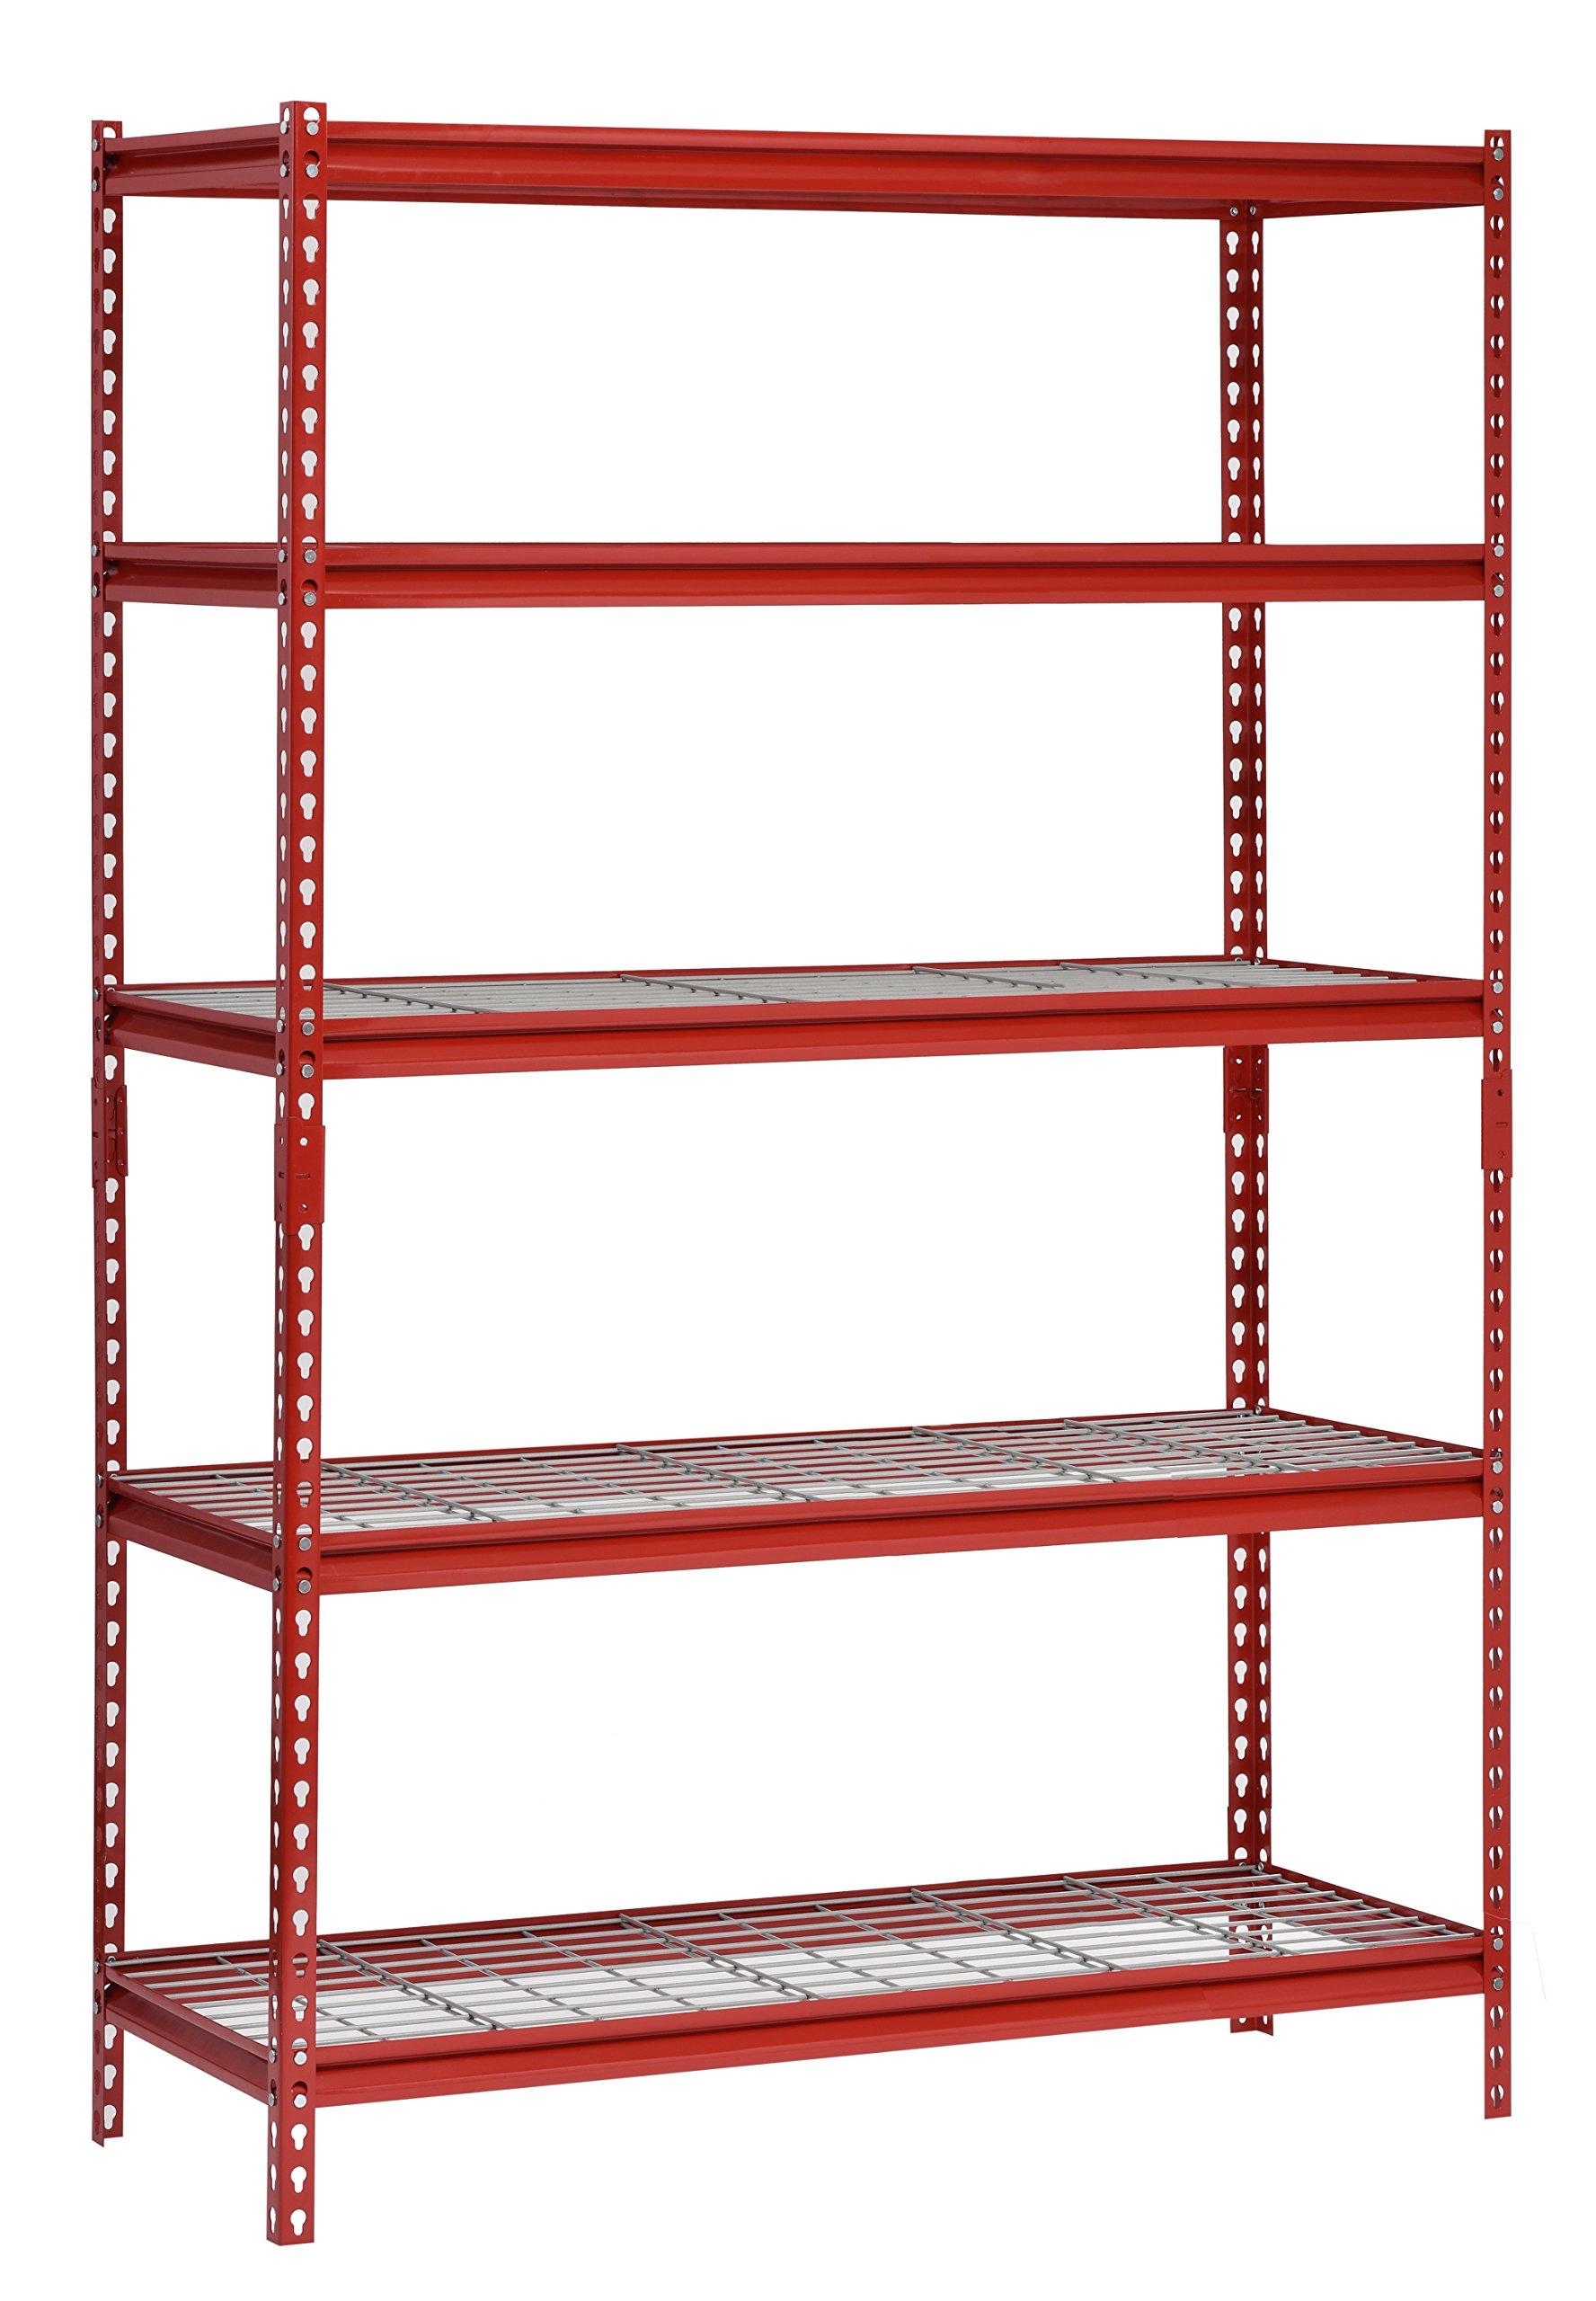 Muscle Rack UR482472WD5-R 5-Shelf Steel Shelving Unit, 48'' Width x 72'' Height x 24'' Length, Red